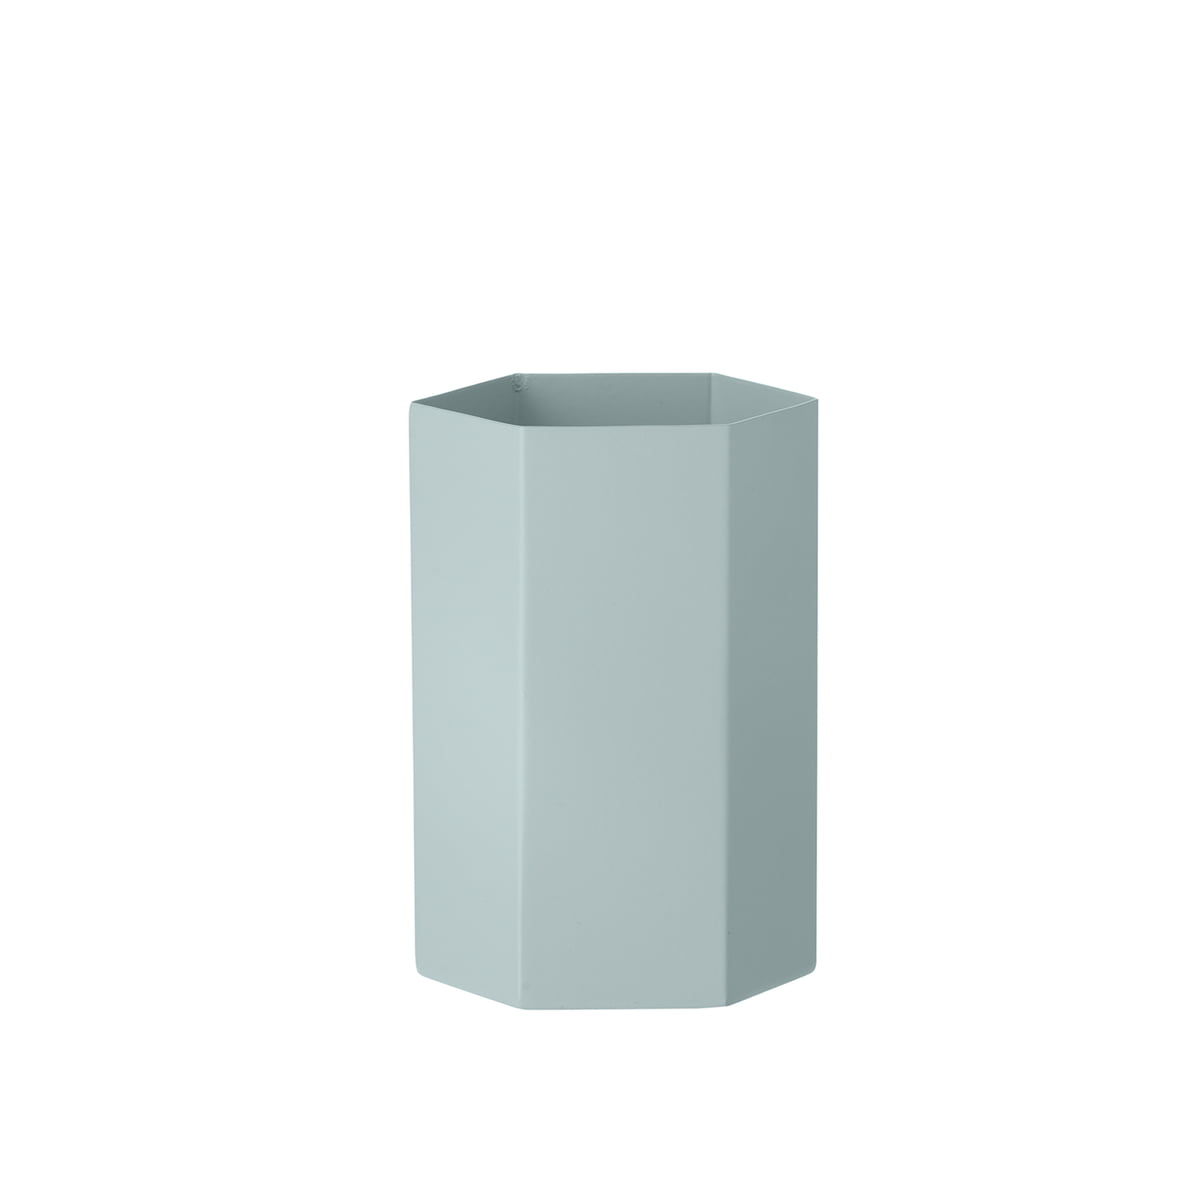 Hexagon vase by ferm living in the shop for Ferm living vase